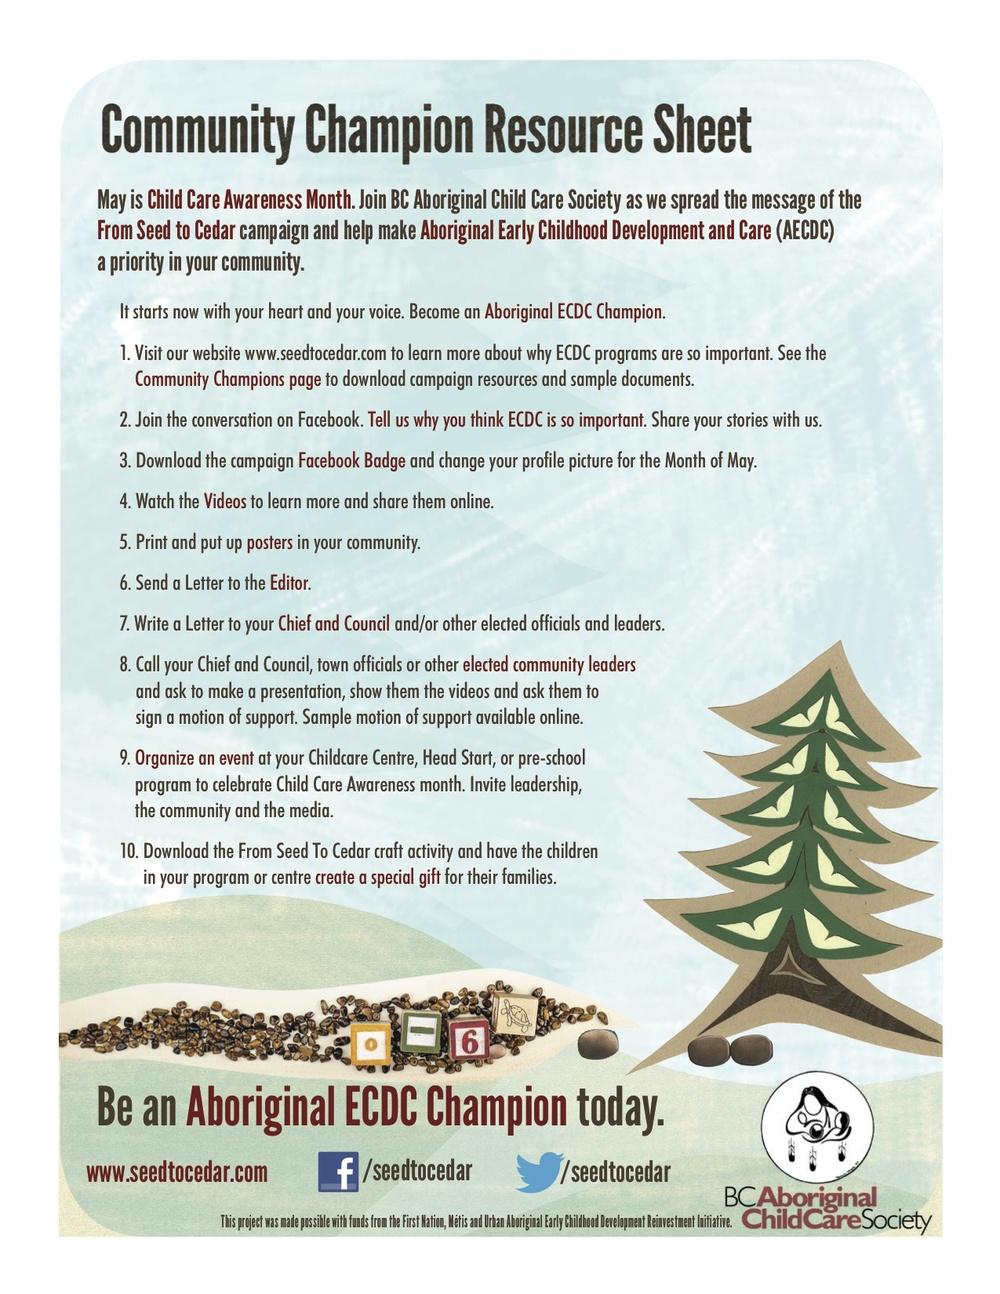 Community Champ Resource Sheet.jpg